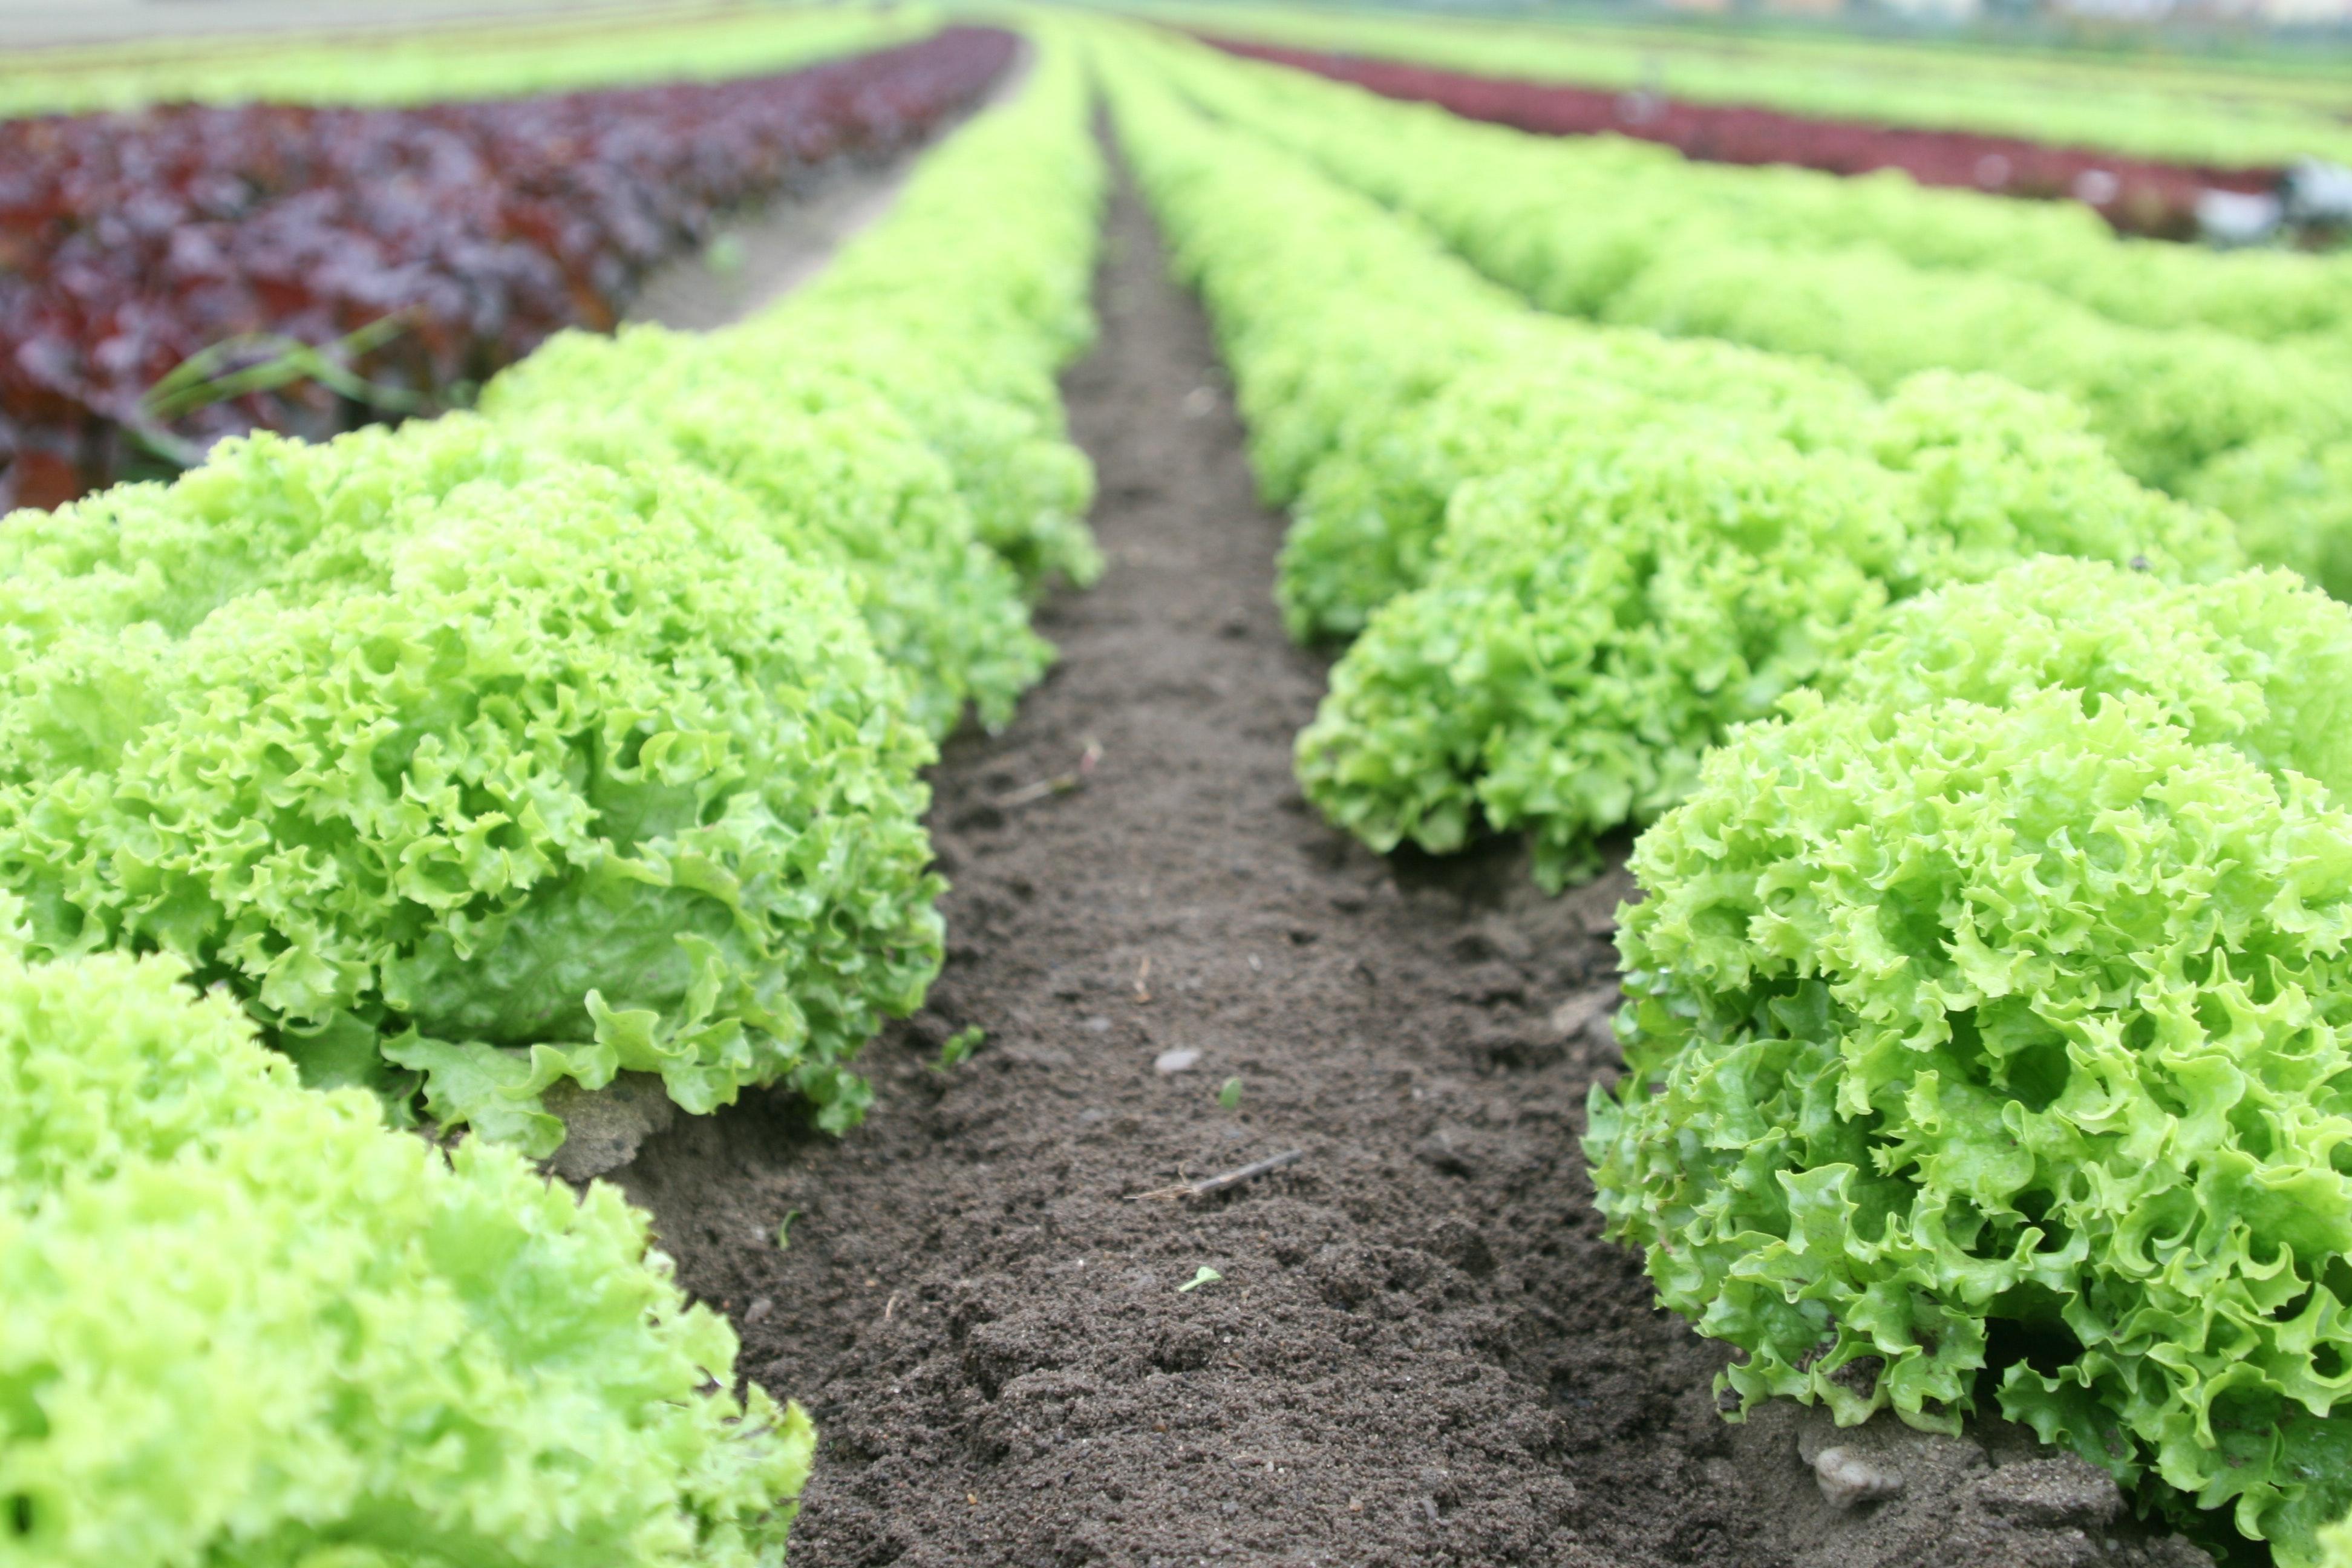 farm-produce-field-food-89267.jpg